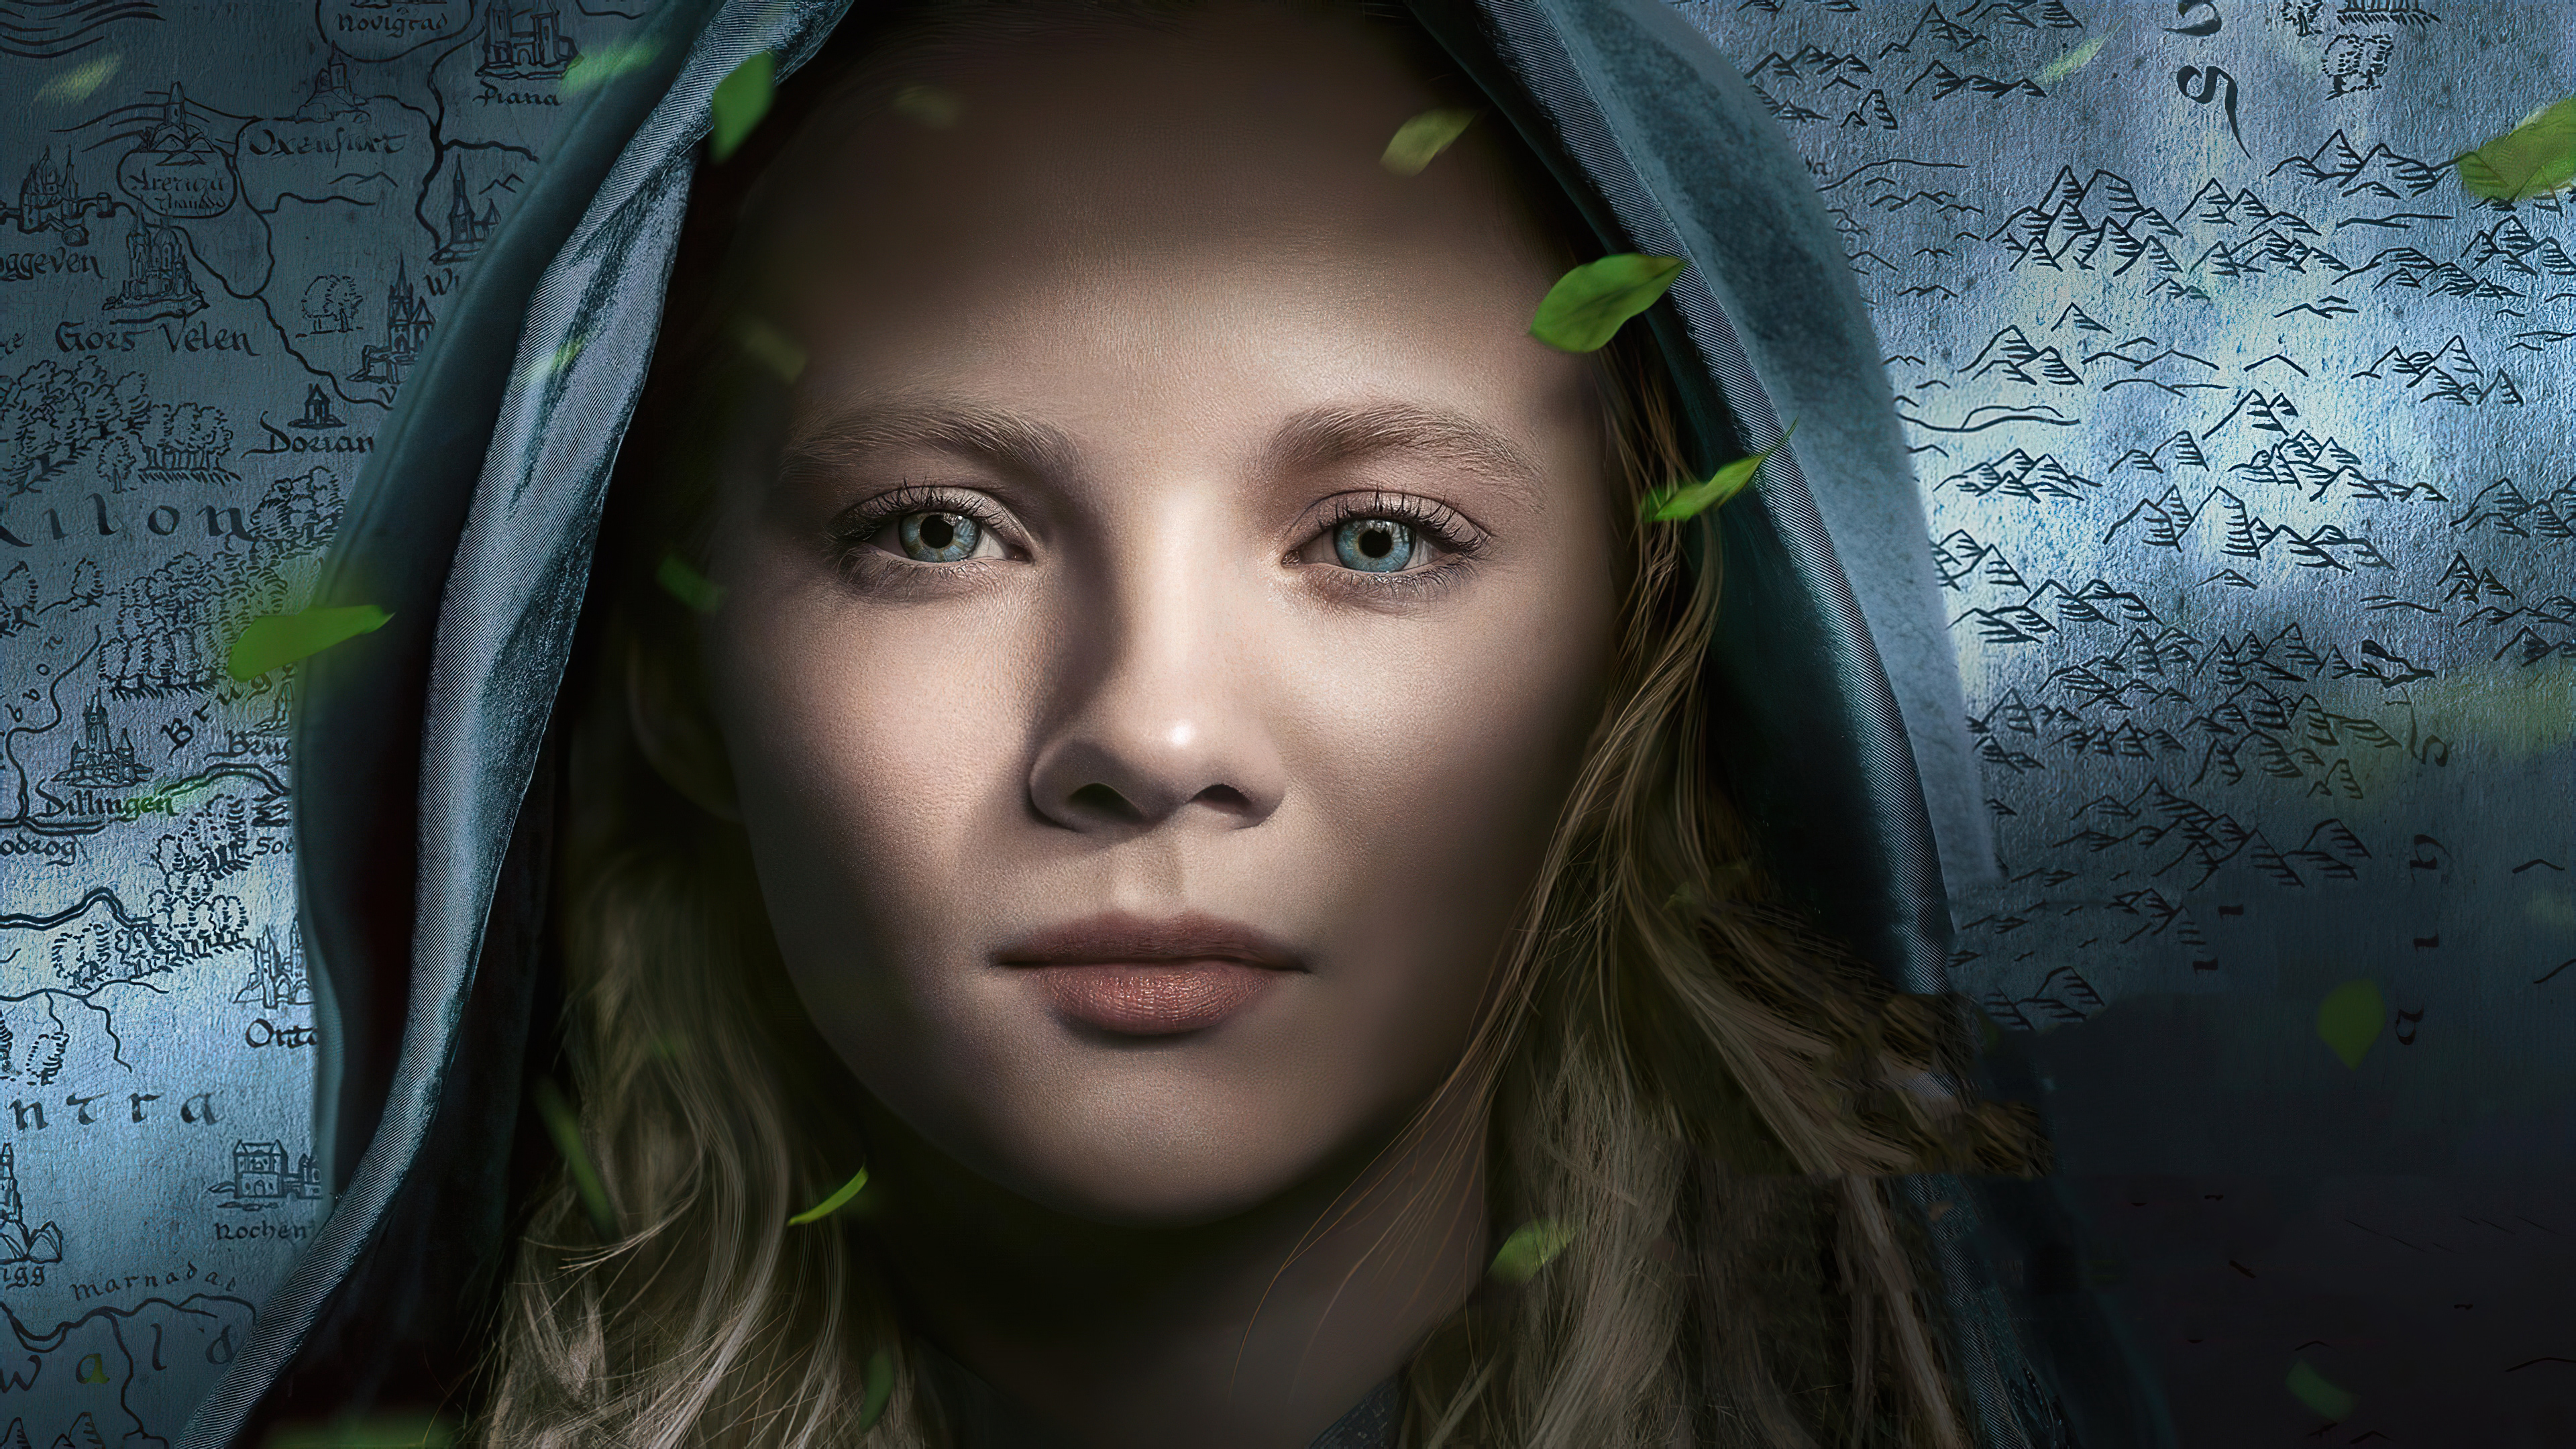 freya allan in the witcher 1576972105 - Freya Allan In The Witcher - Freya Allan In The Witcher wallpaper hd, Freya Allan In The Witcher 4k wallpaper